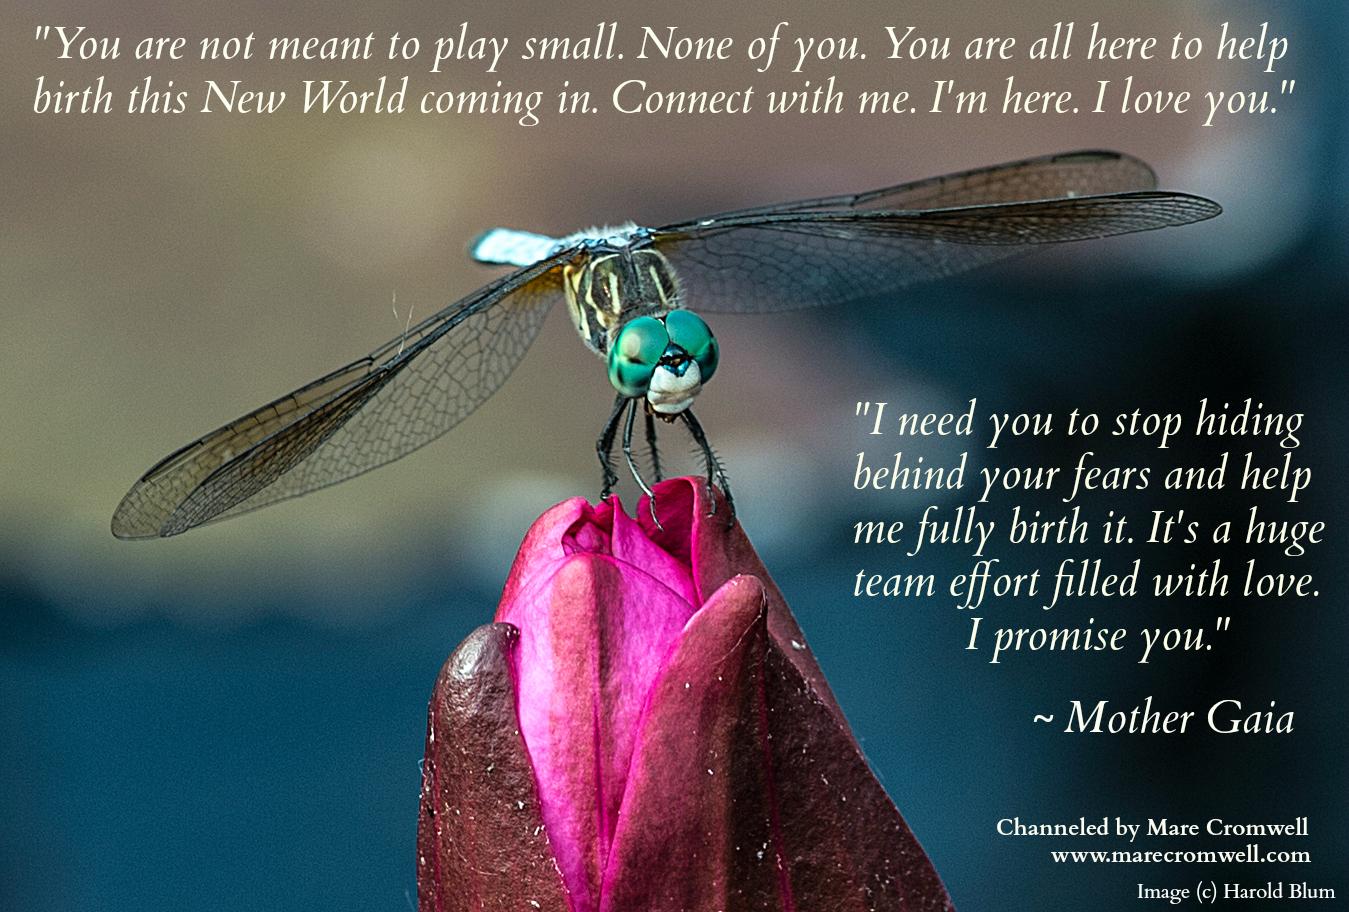 5.25.DragonflyBud.Msg